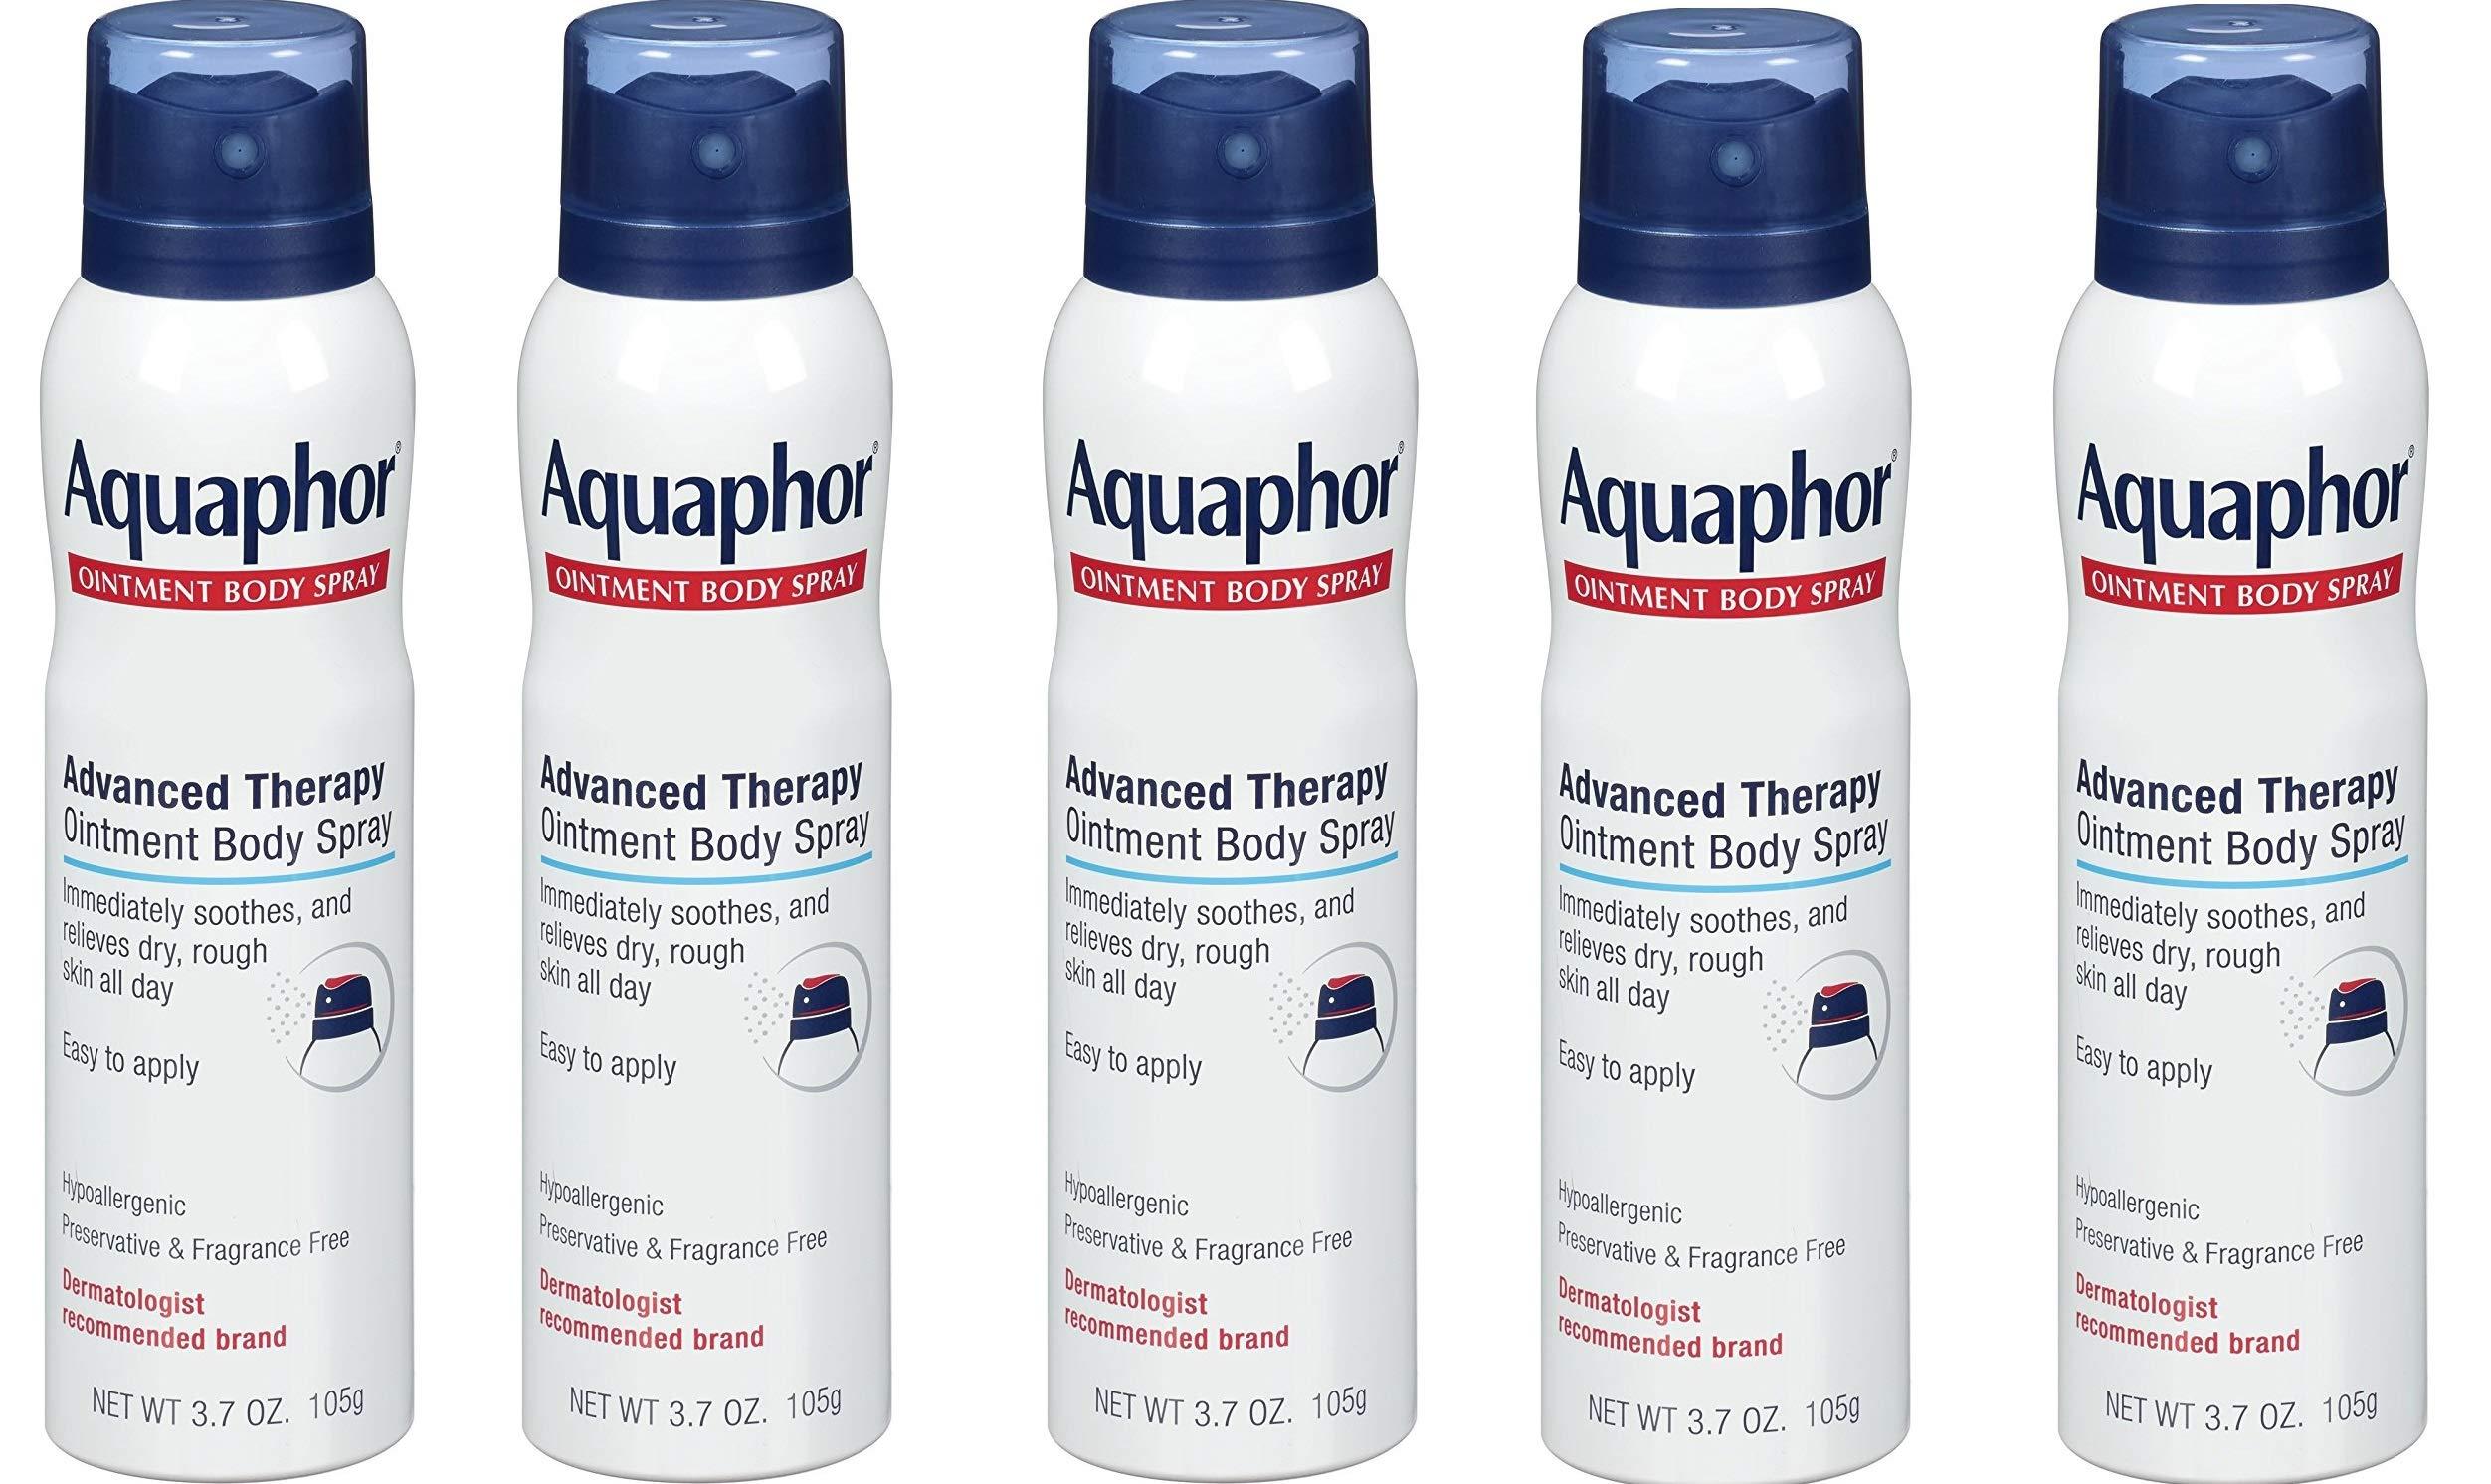 Aquaphor Ointment Body Spray - Moisturizes and Heals Dry, Rough Skin - 3.7 oz. Spray Can, 5 Pack